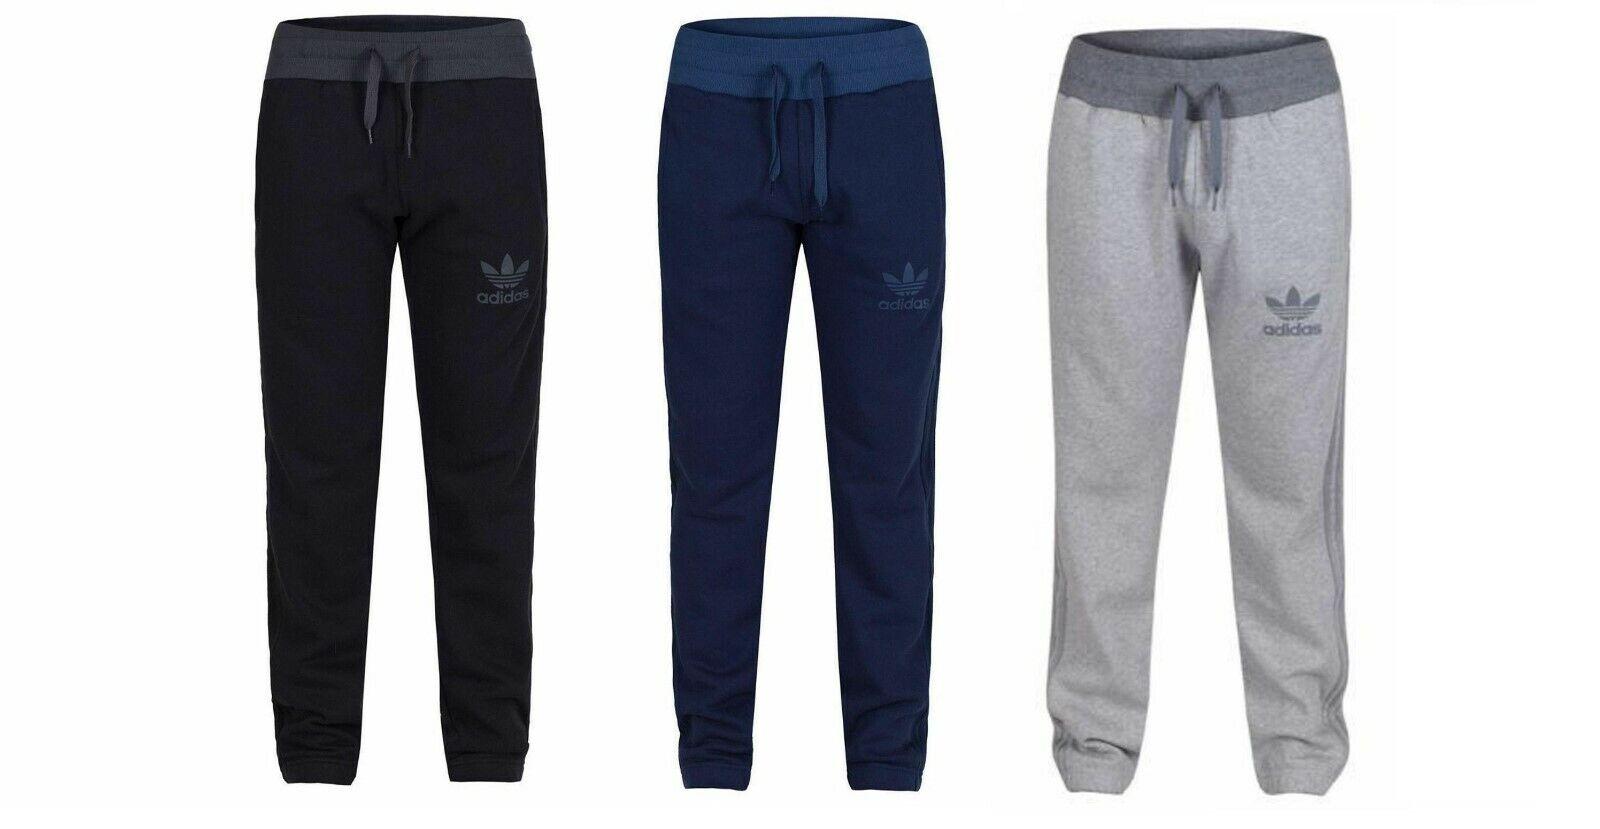 Adidas Mens SPO Sweat Pants  Navy Trefoil Logo Joggers  Navy AB7580